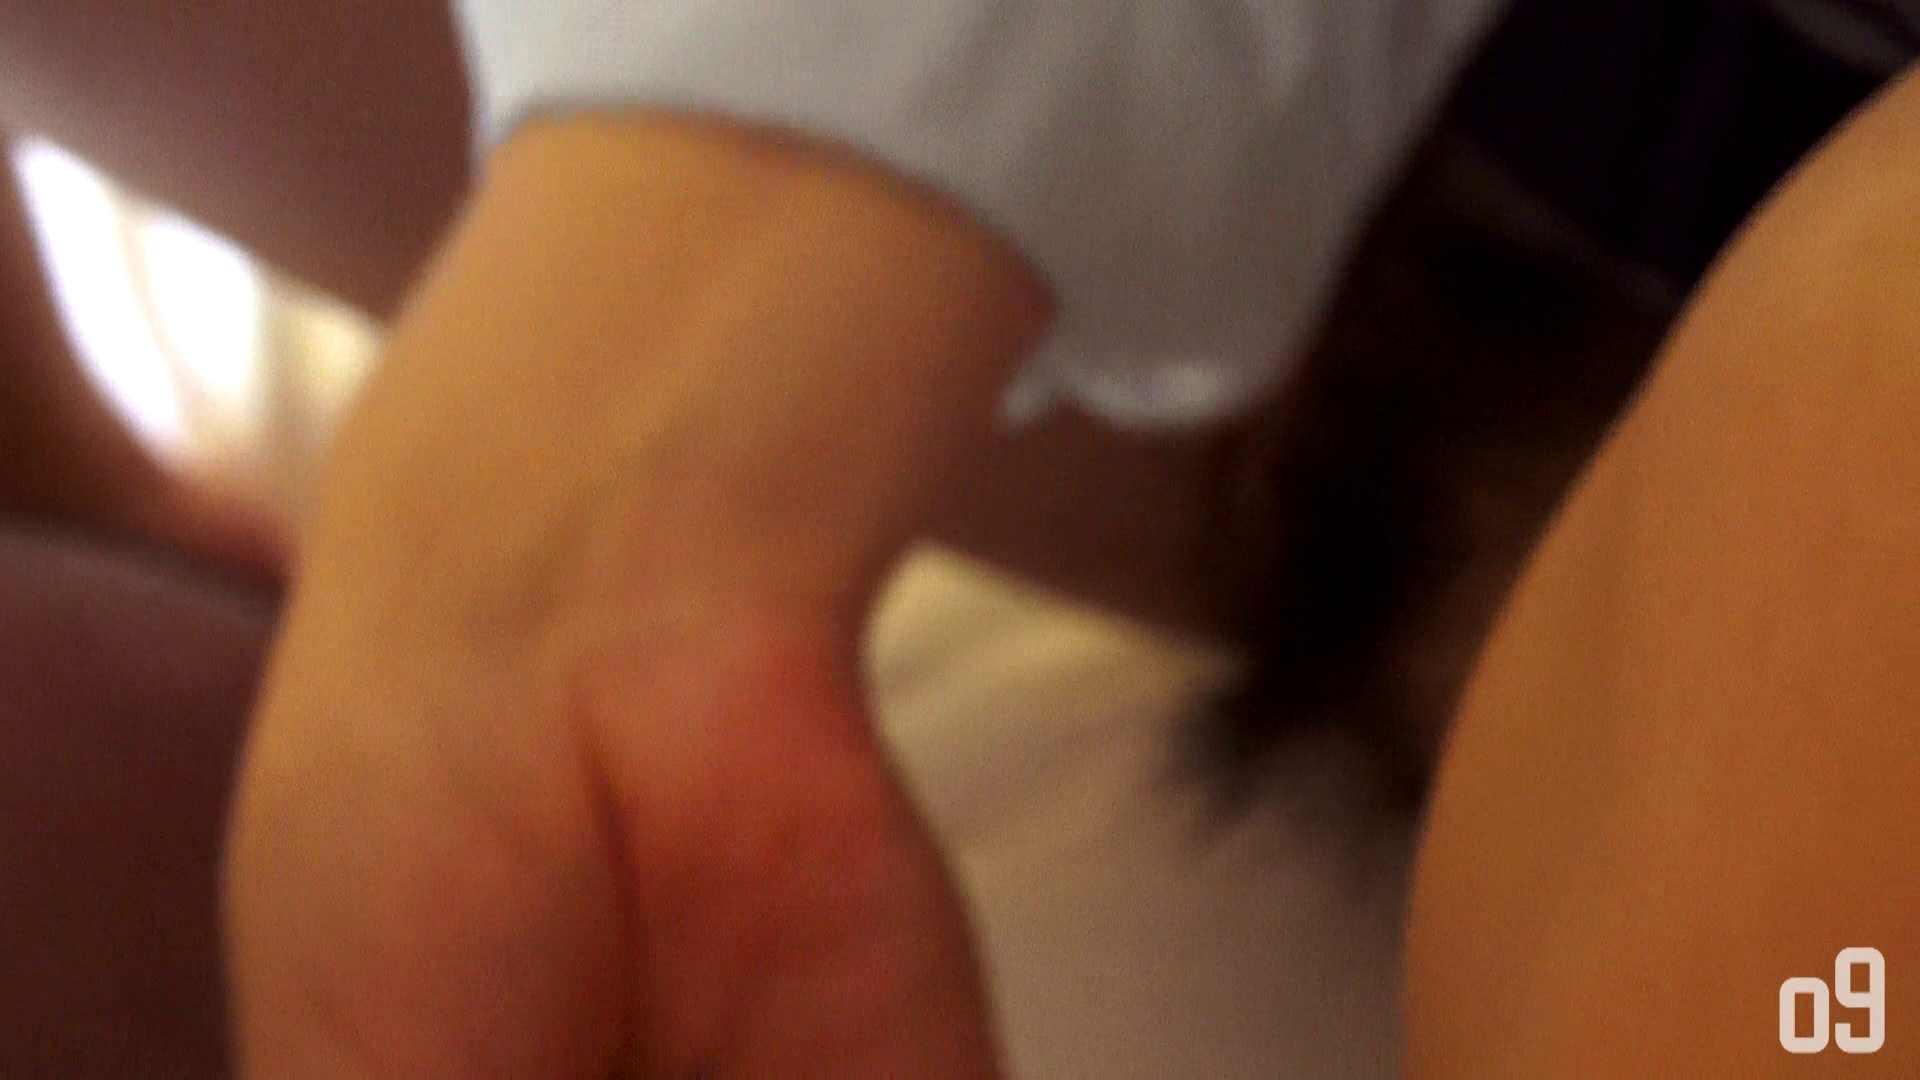 vol.6 TKSさんが震える!留華ちゃんの不慣れな手コキで念願の射精! ギャル攻め  89画像 74